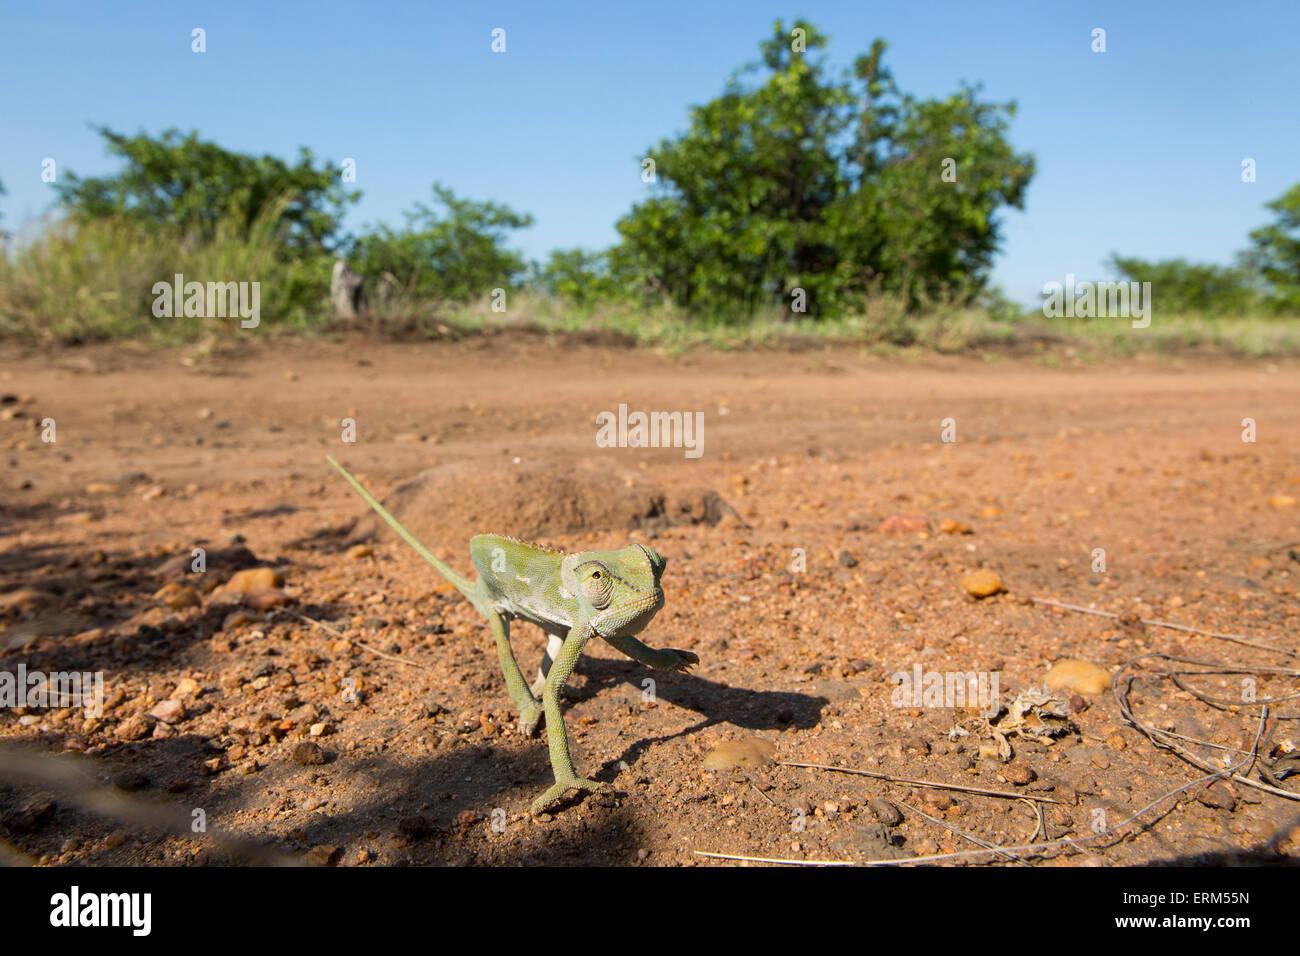 South Africa, Mpumalanga Province, Kruger National Park, Flap Necked Chameleon (Chamaeleo dilepis) walking across - Stock Image